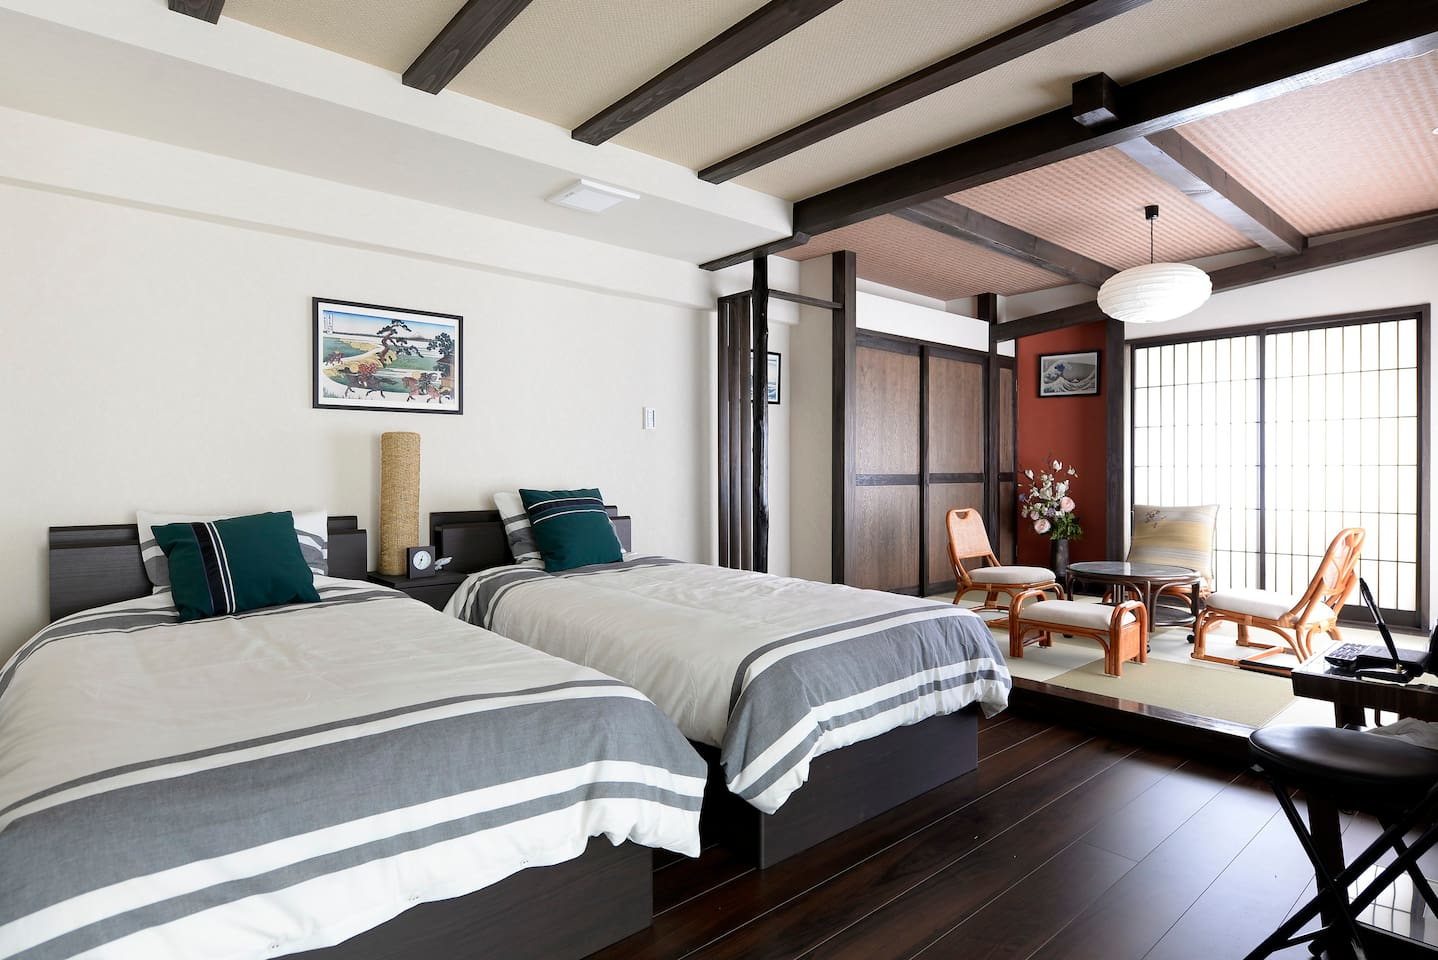 Bedroom and tatami room